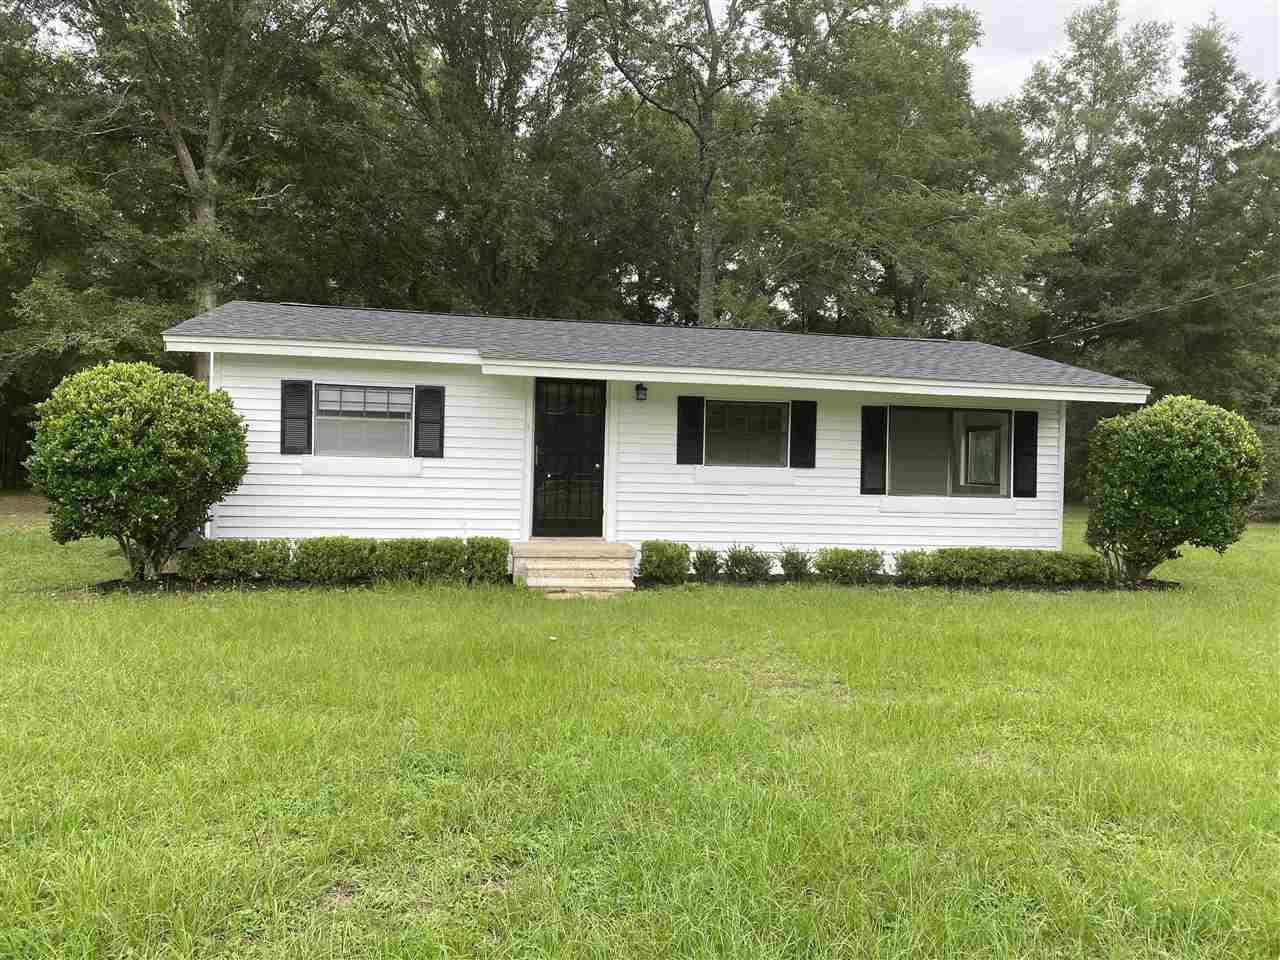 Photo of 660 Henry Jones Road, TALLAHASSEE, FL 32305 (MLS # 337639)